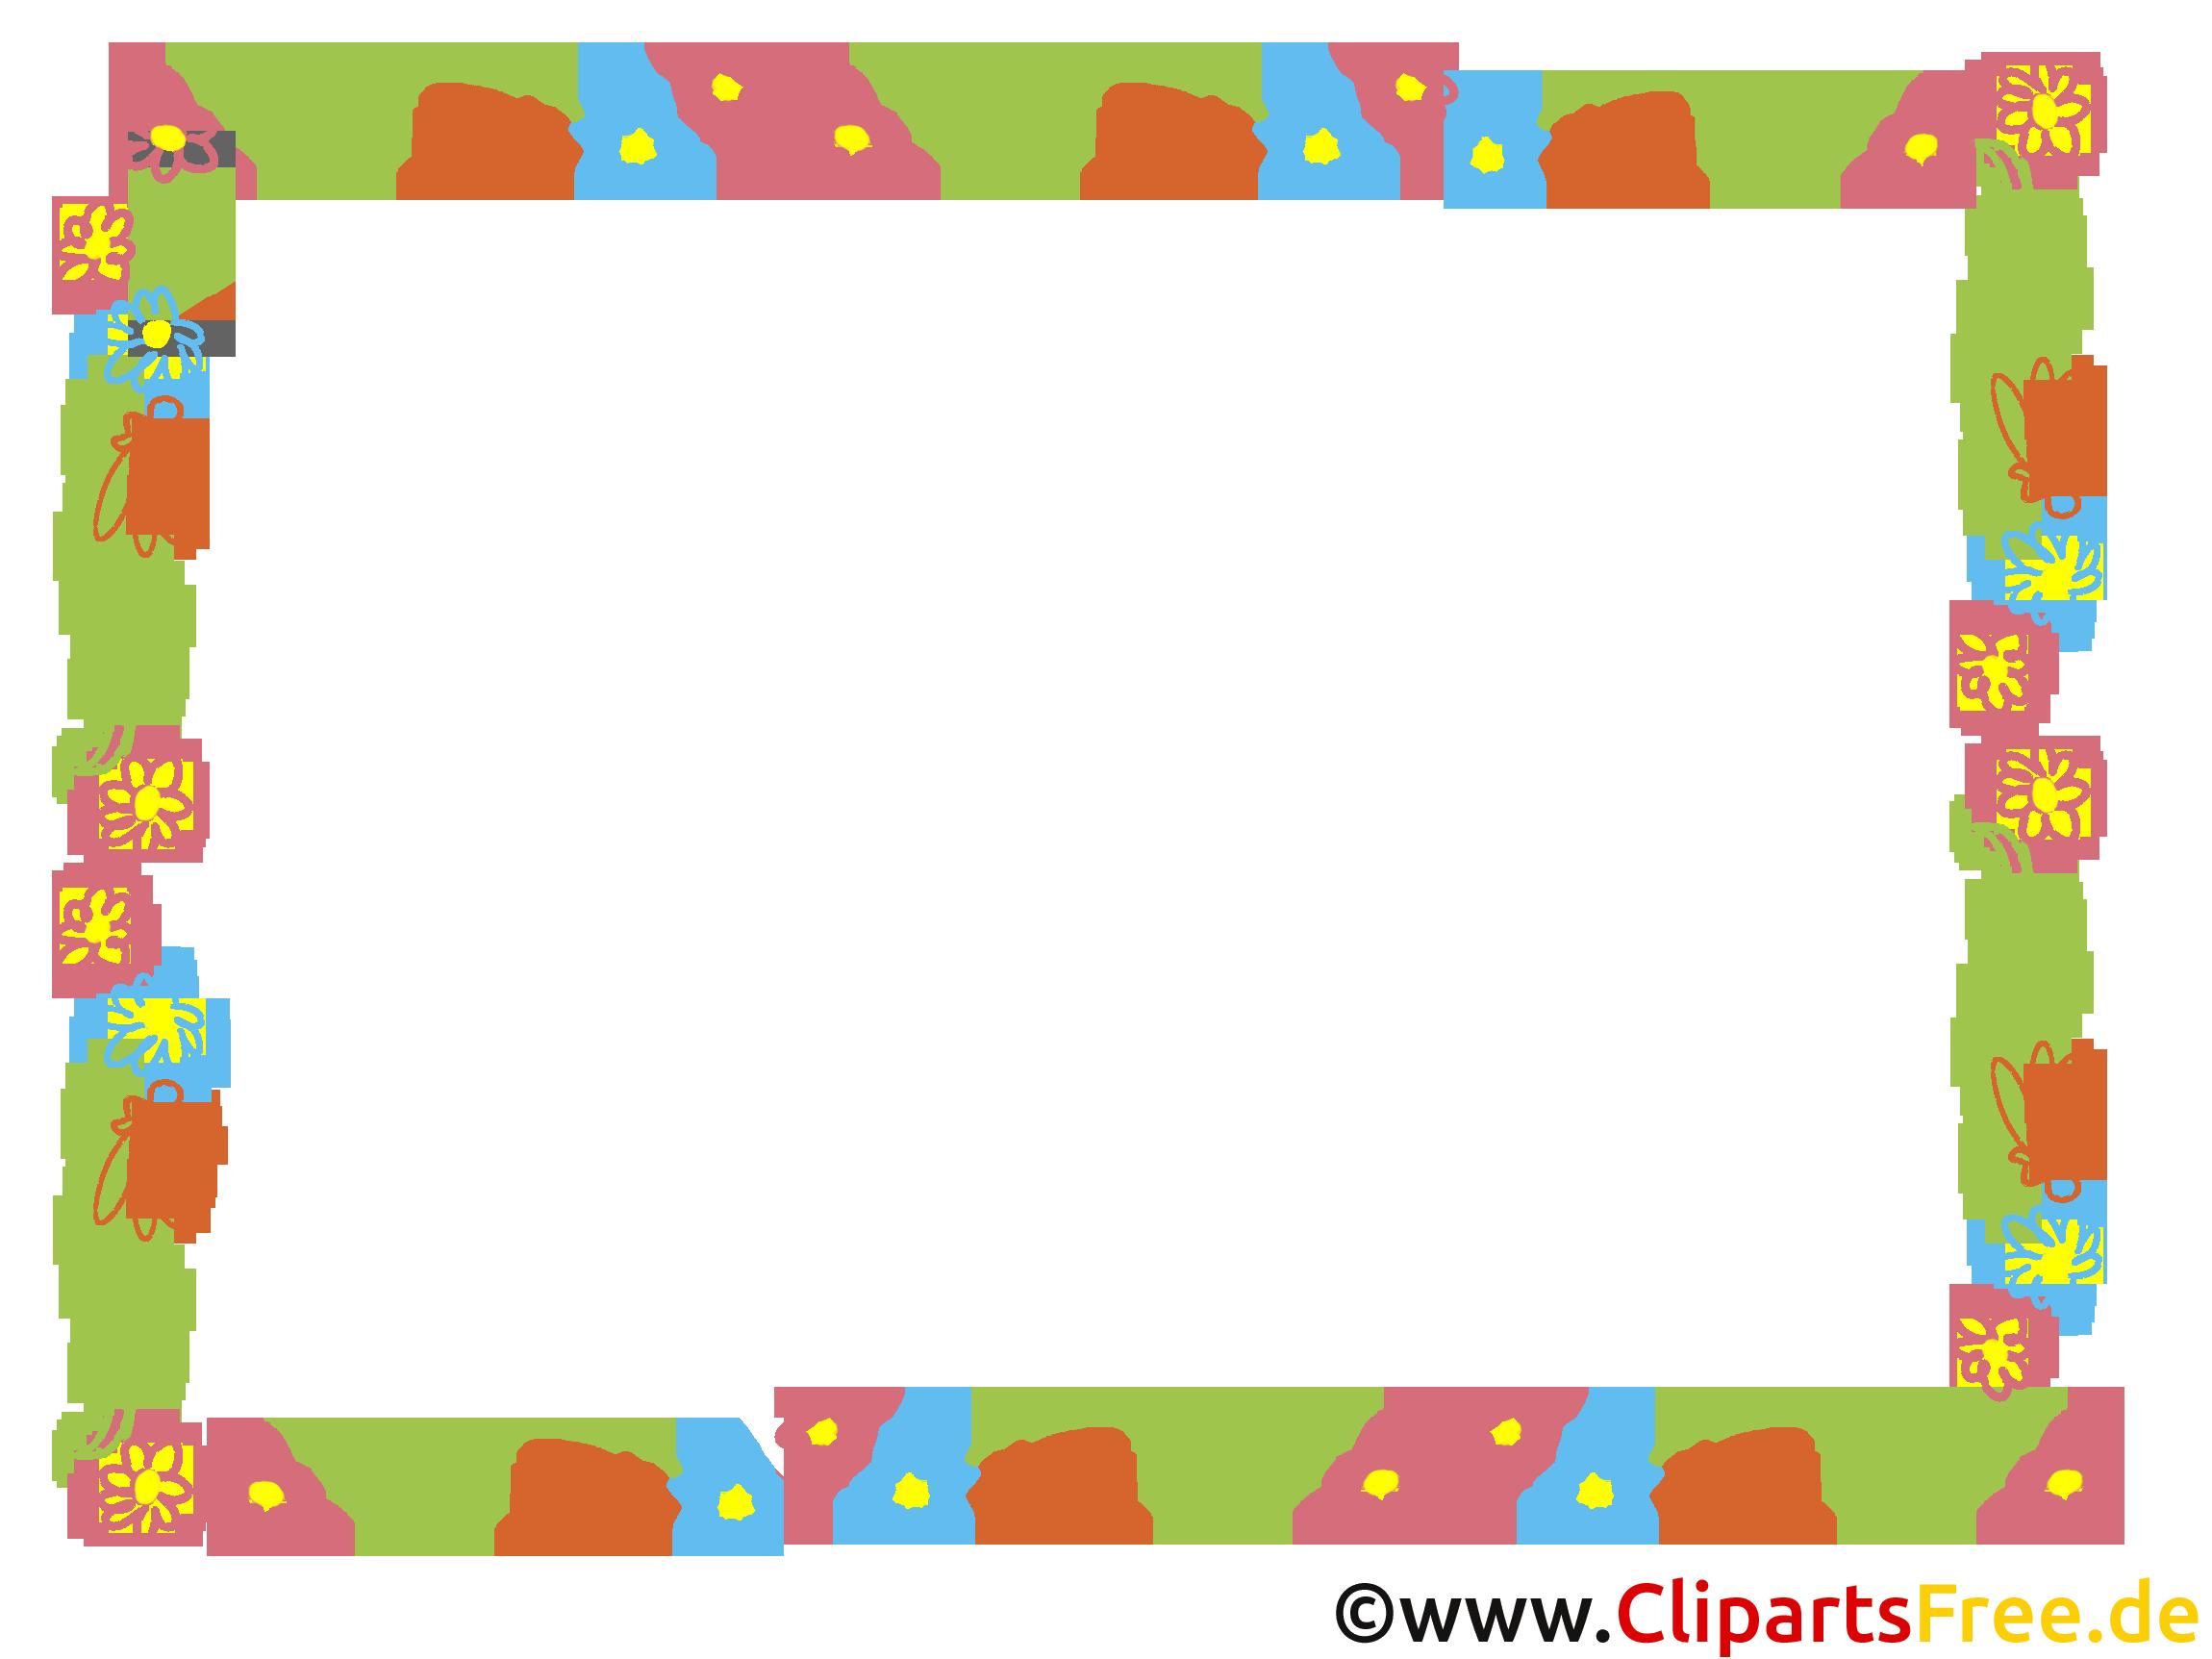 PNG Rahmen Geburtstag - 67712